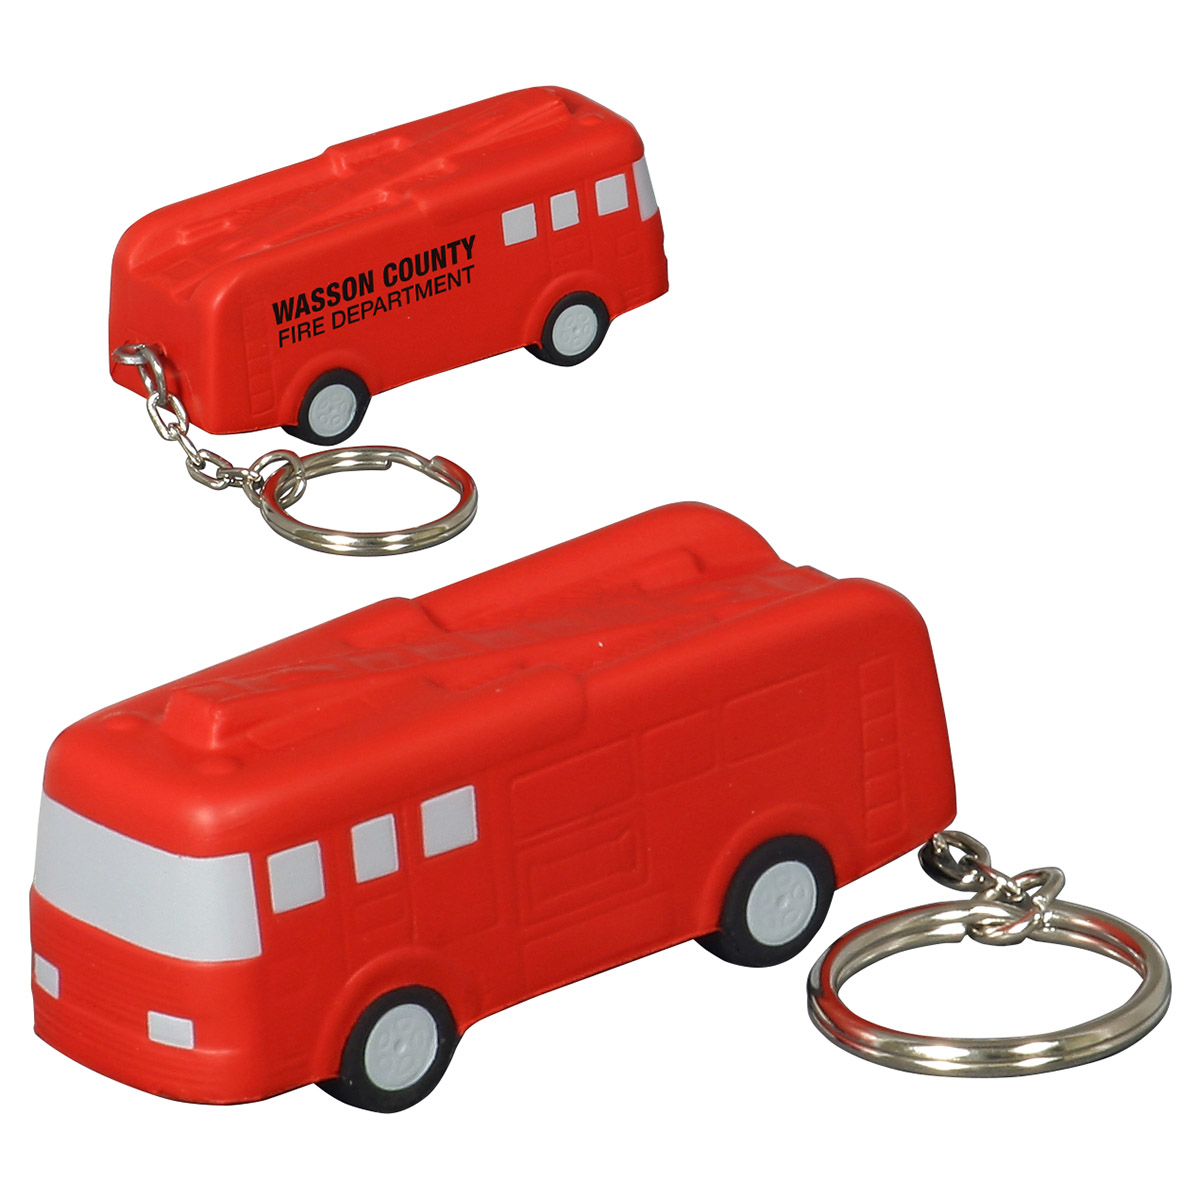 Fire Truck Stress Reliever Keychain, LKC-FT25 - 1 Colour Imprint